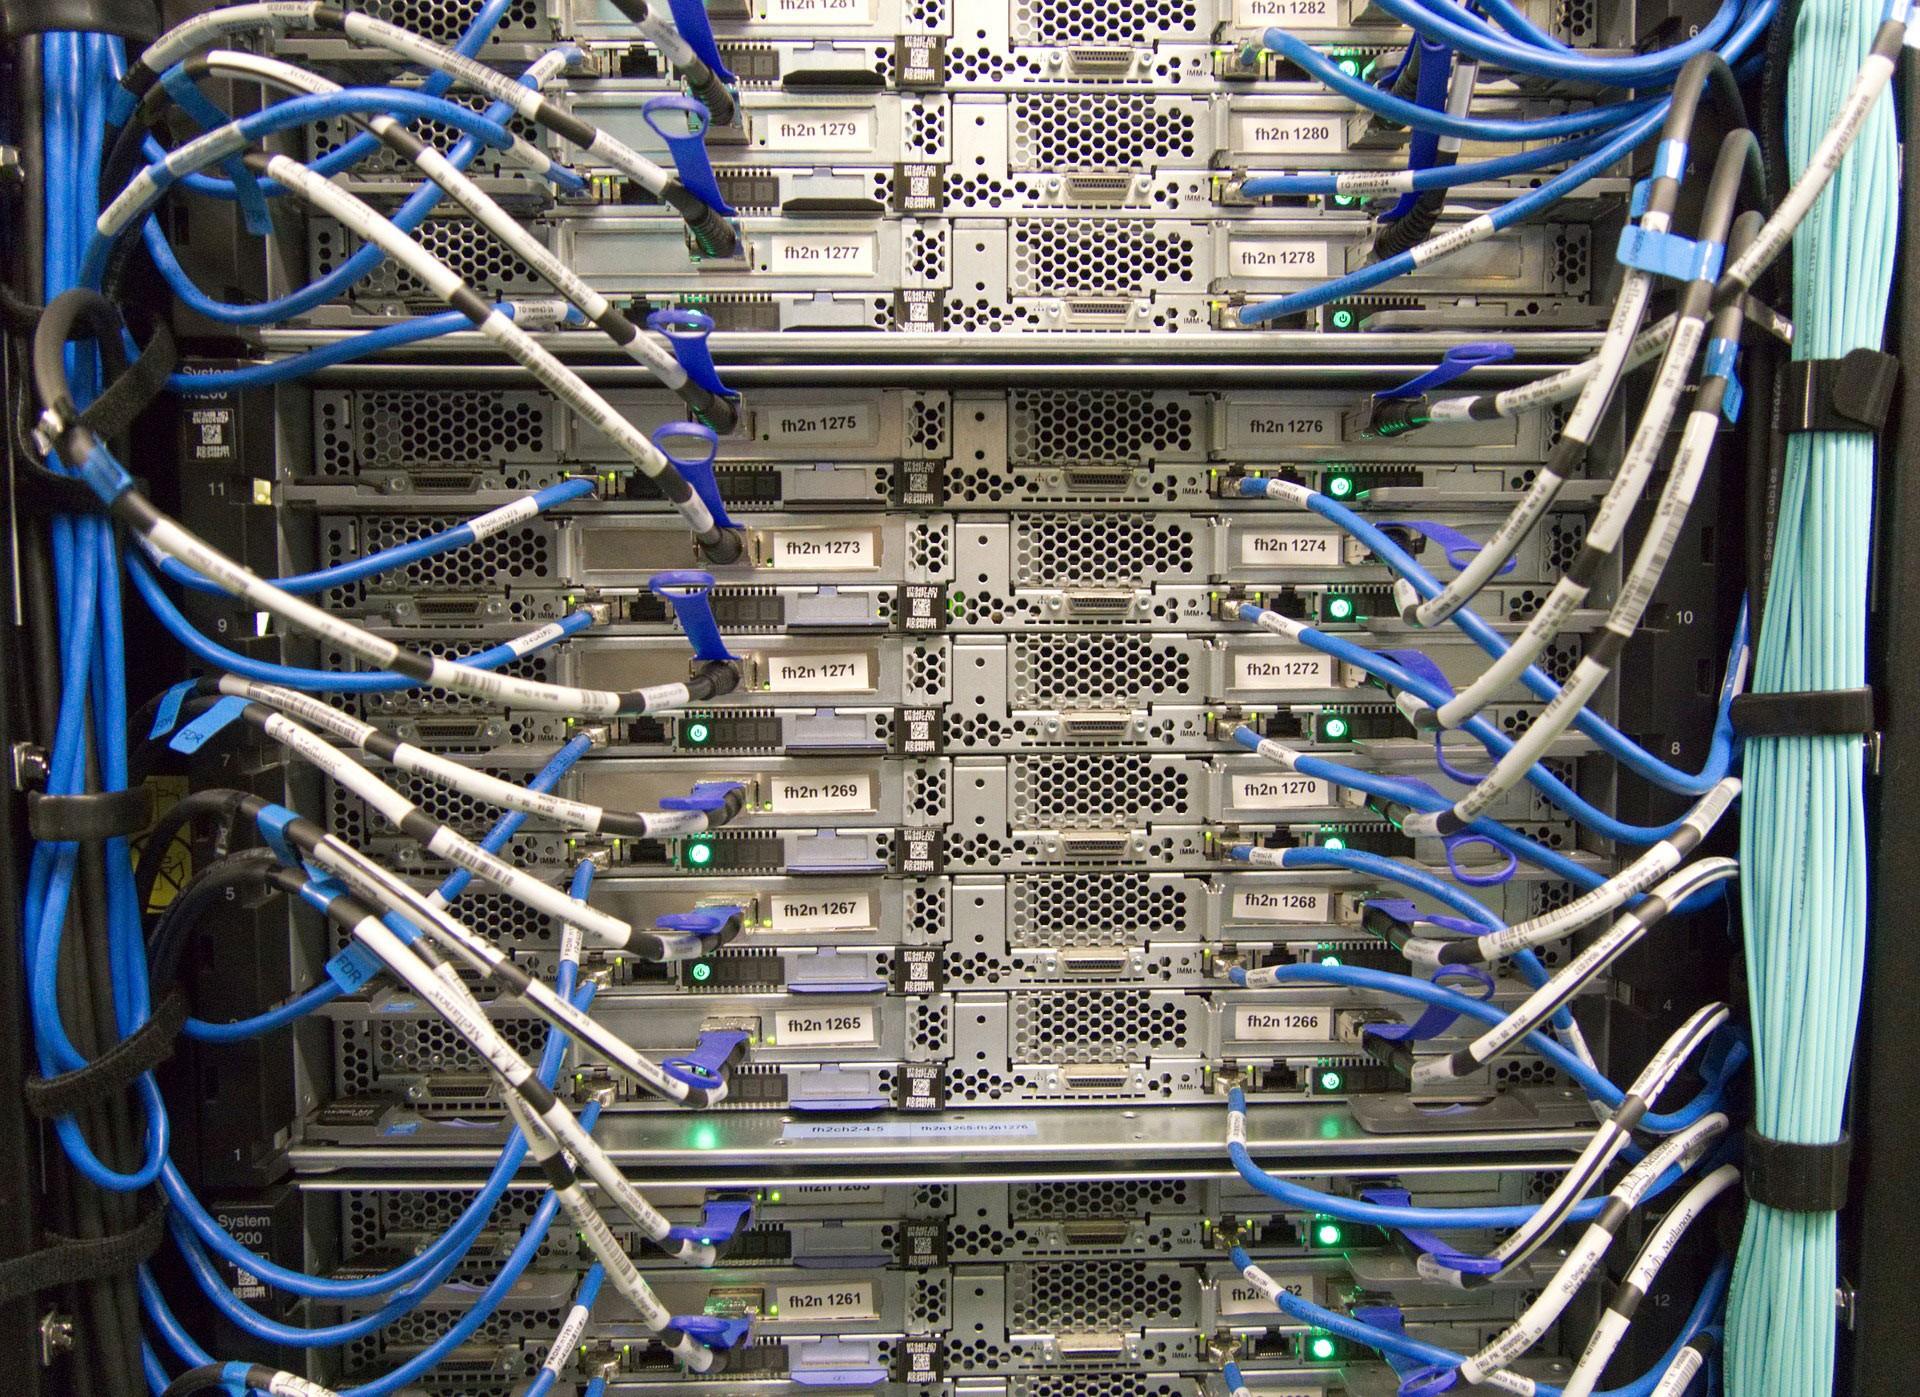 Server (Symbolbild)